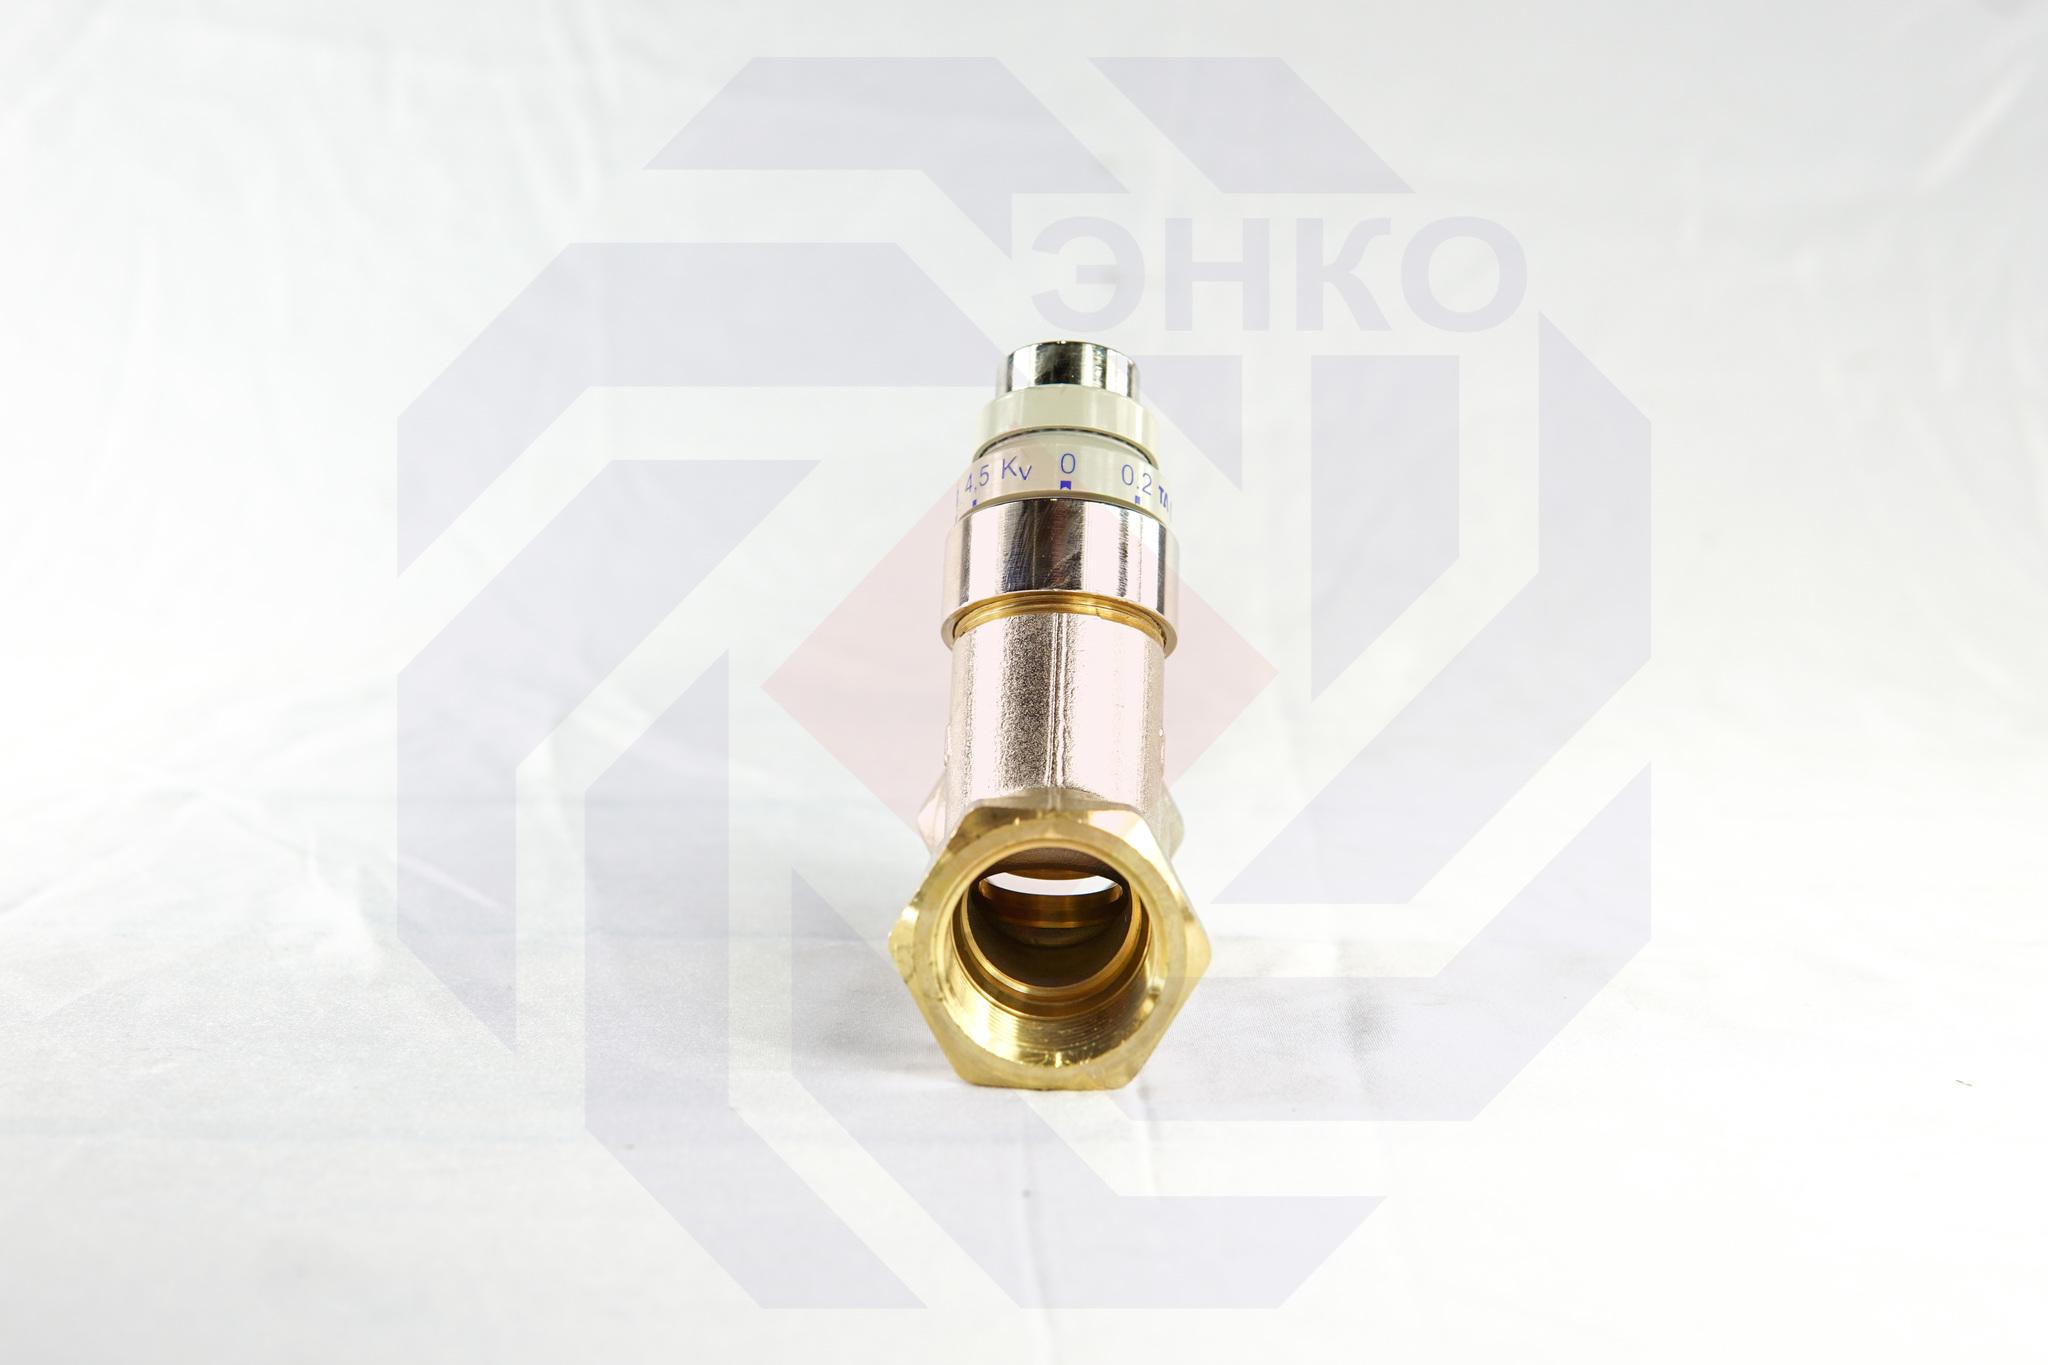 Клапан балансировочный IMI STK DN 20